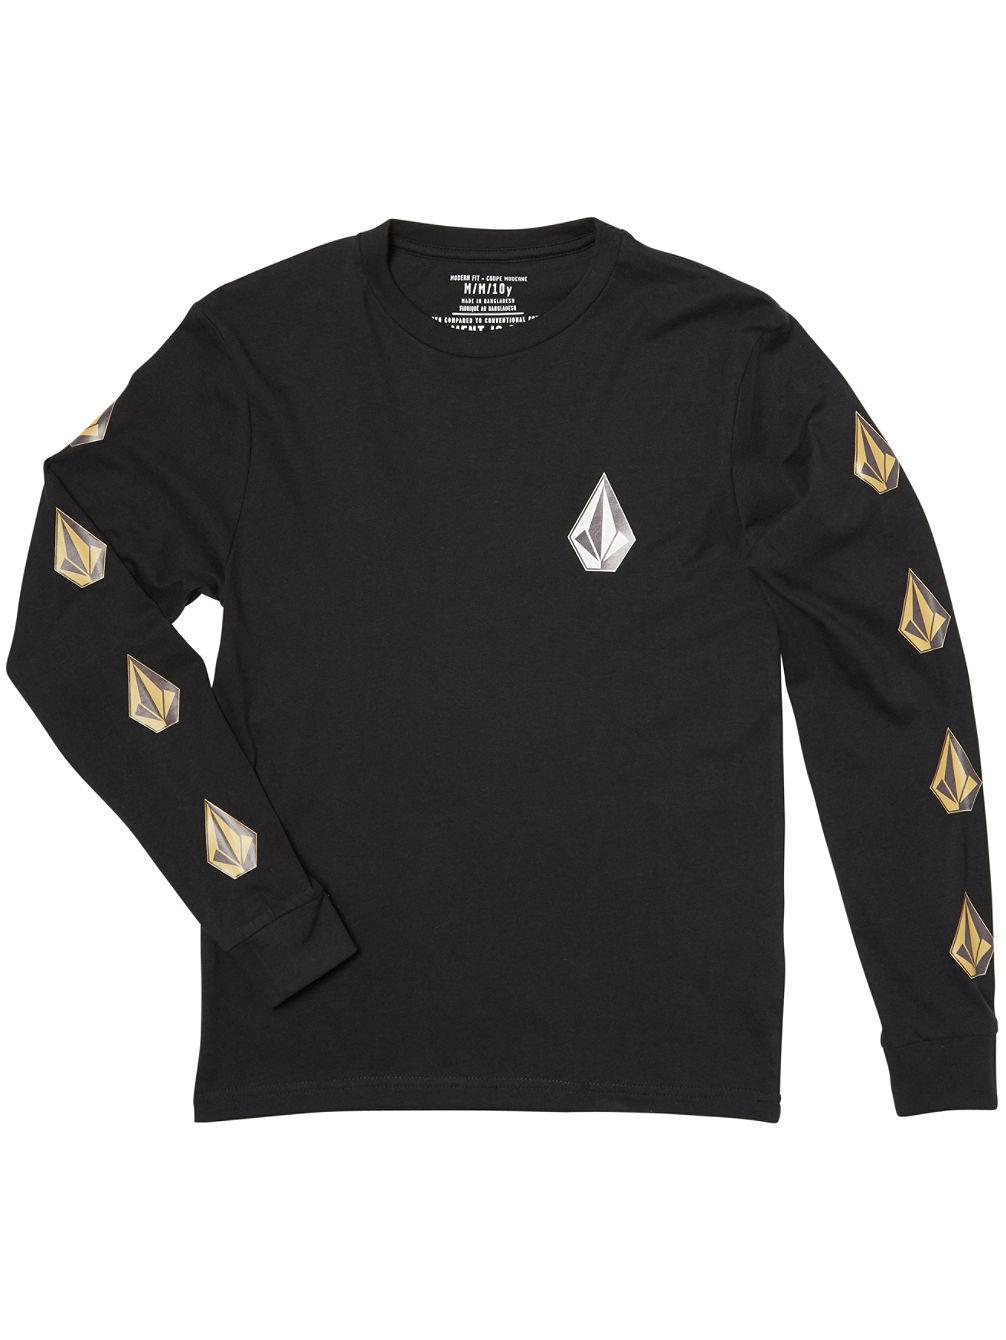 Achat Volcom Deadly Stone Bsc Longsleeve T-shirt En Ligne